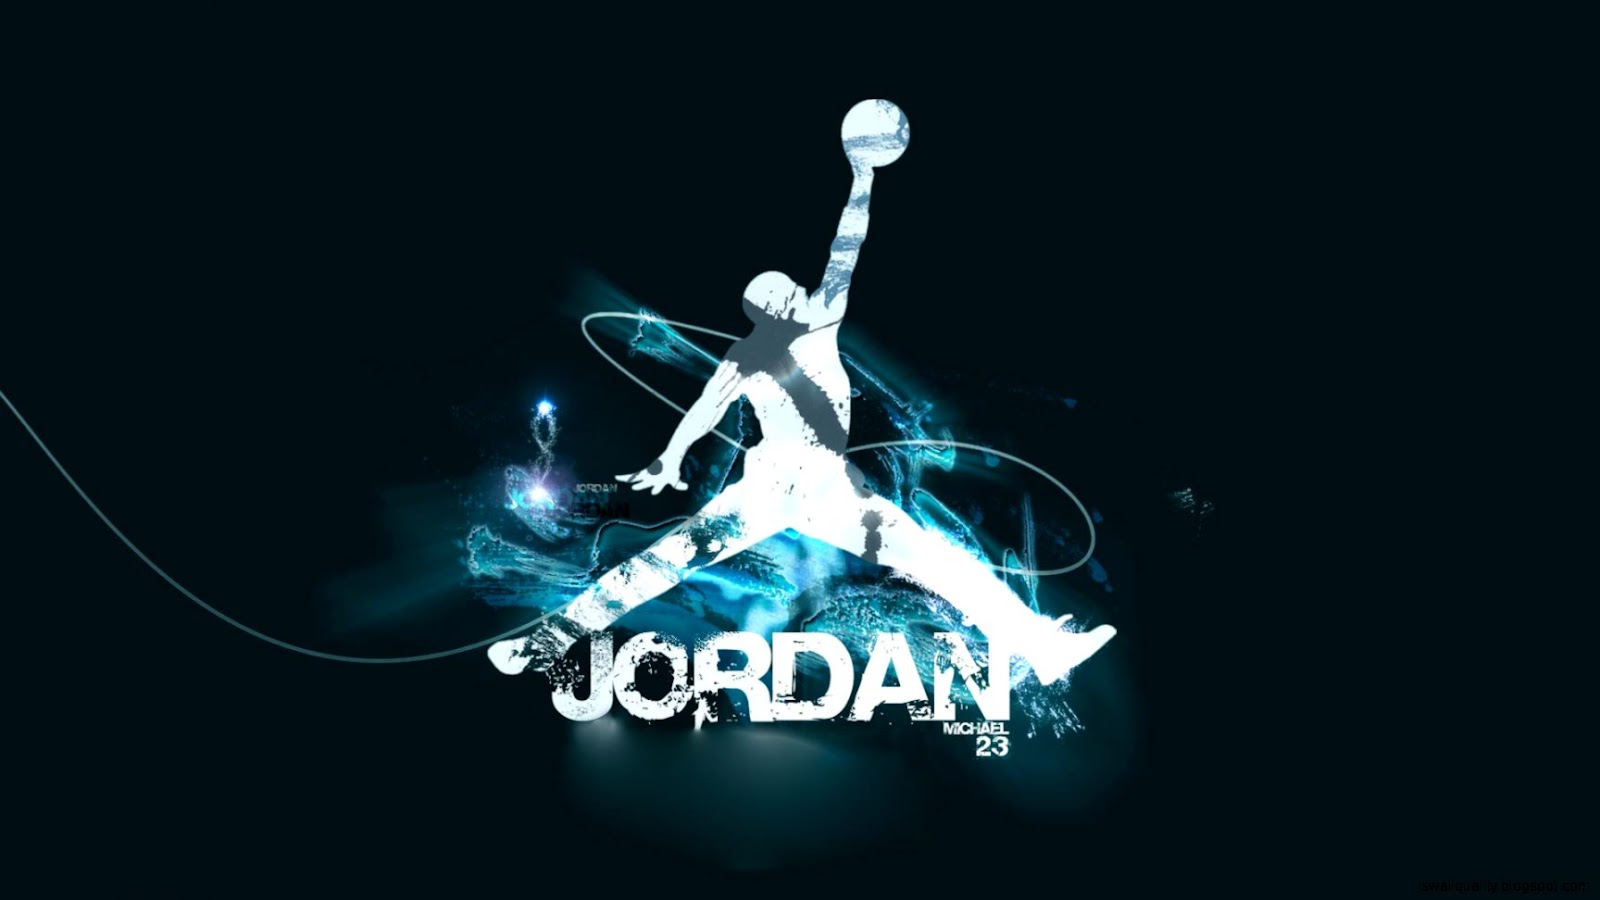 Wallpaper Hd 1080p Black And White Michael Jordan Wallpapers Quality